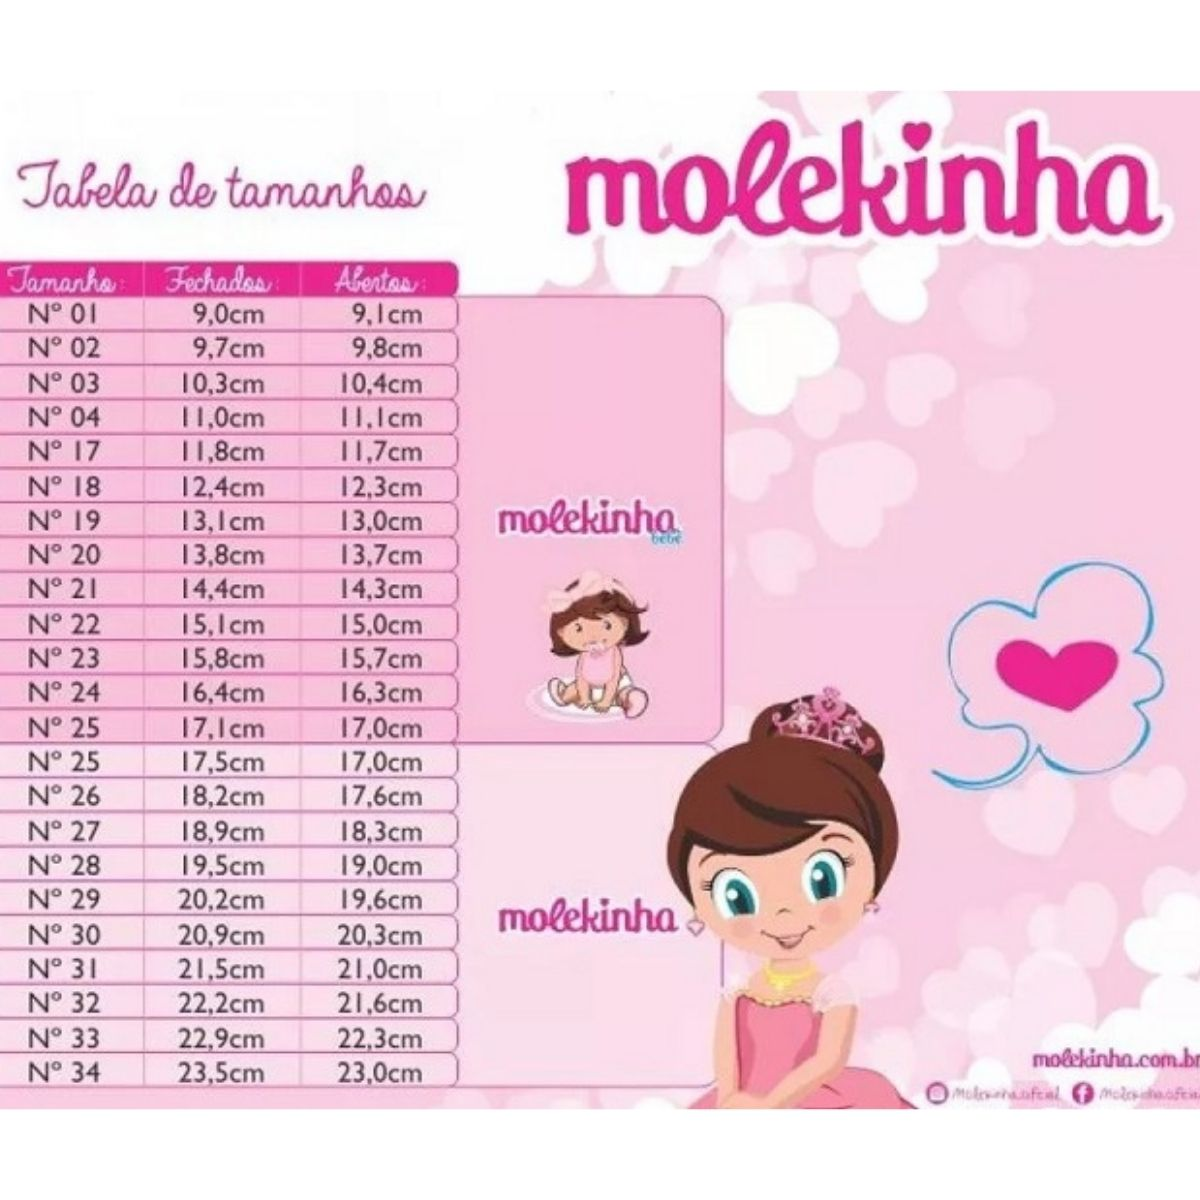 Tenis Molekinha 25201211